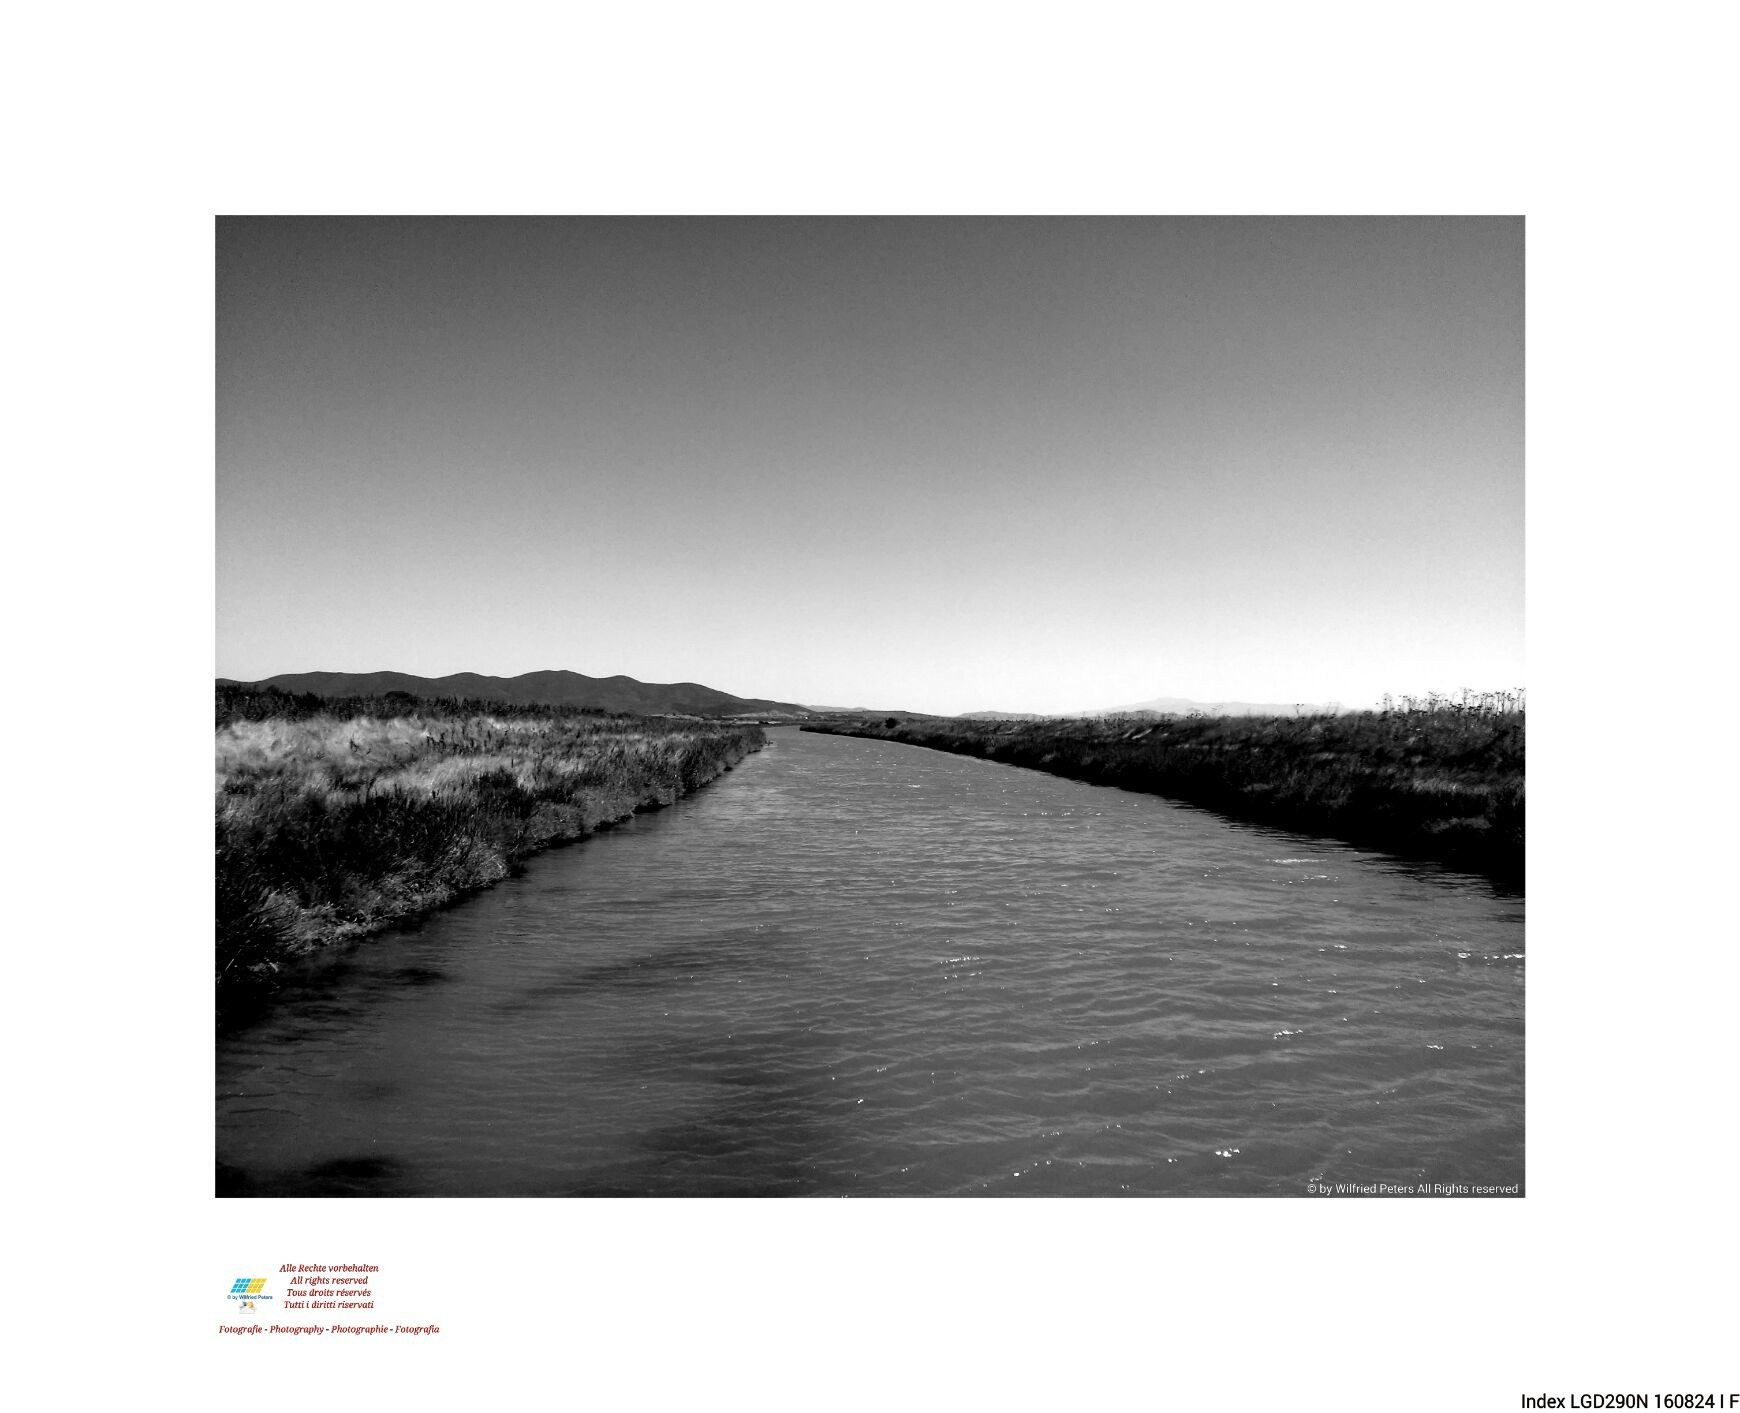 #Fotografie #Photography #Photographie #Fotografia #Schwarzweiss #BlackandWhite #Camaïeu #Monochromatico